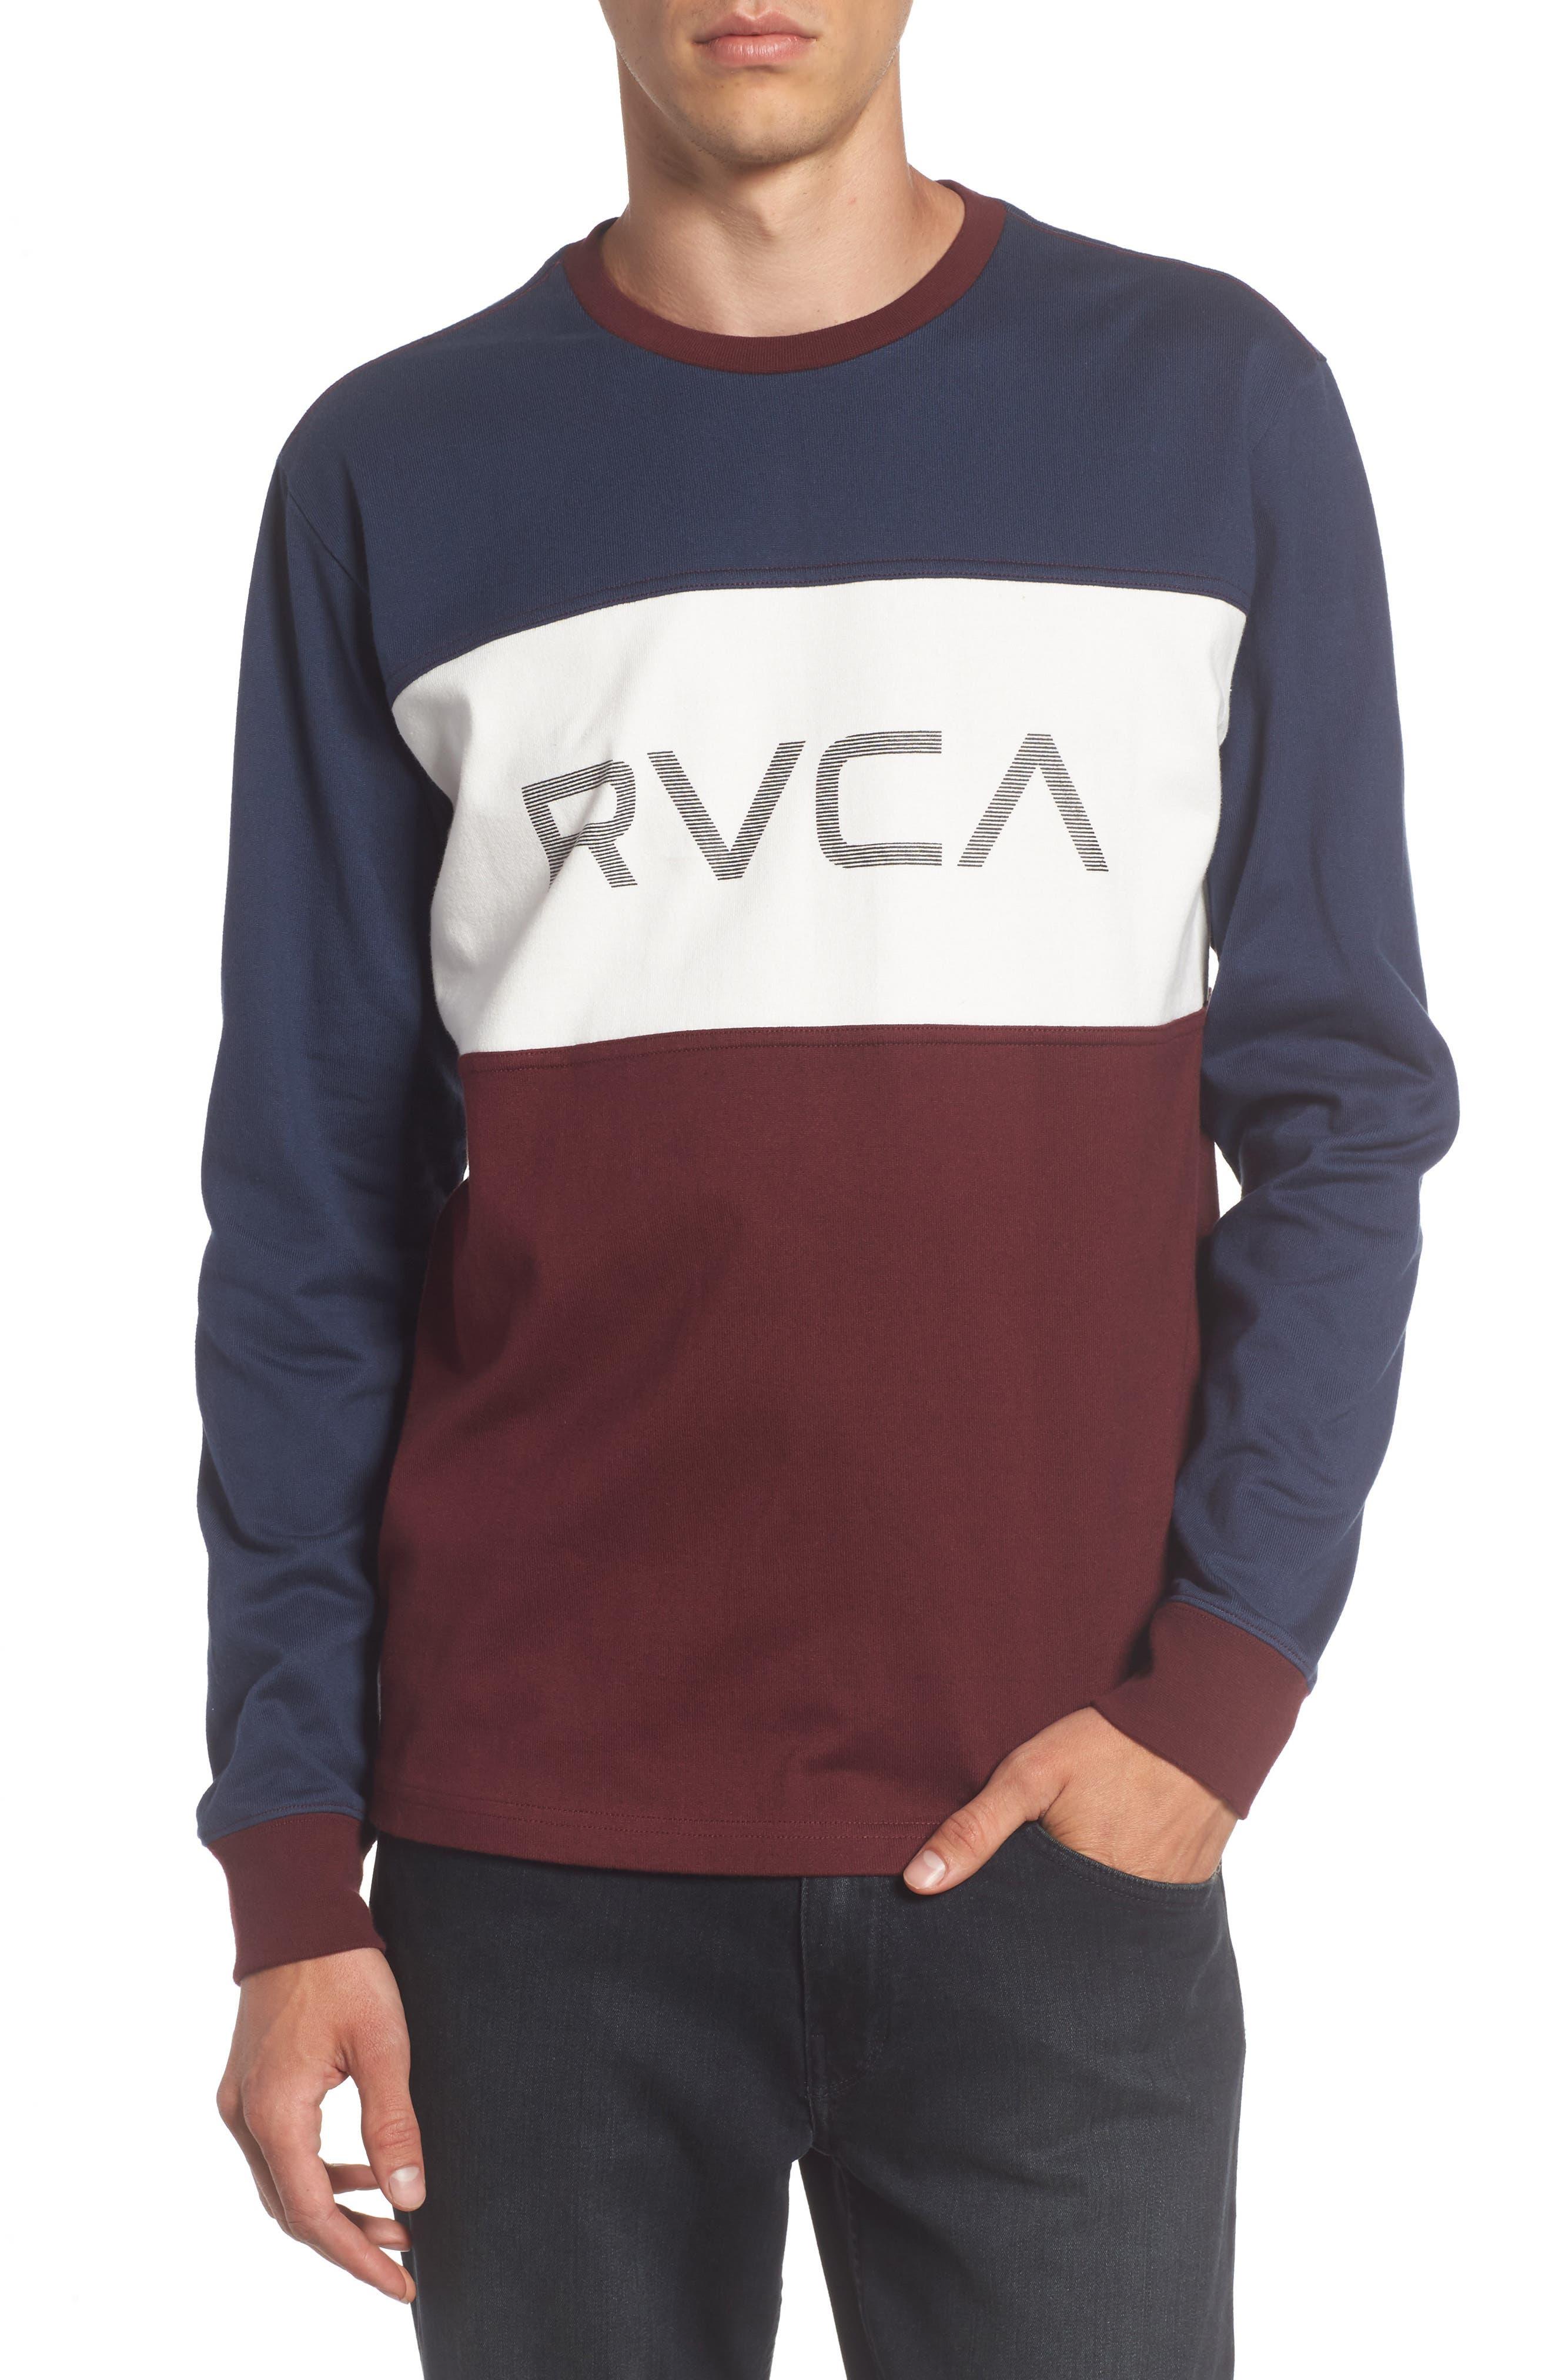 RVCA Heavy Hitter Shirt